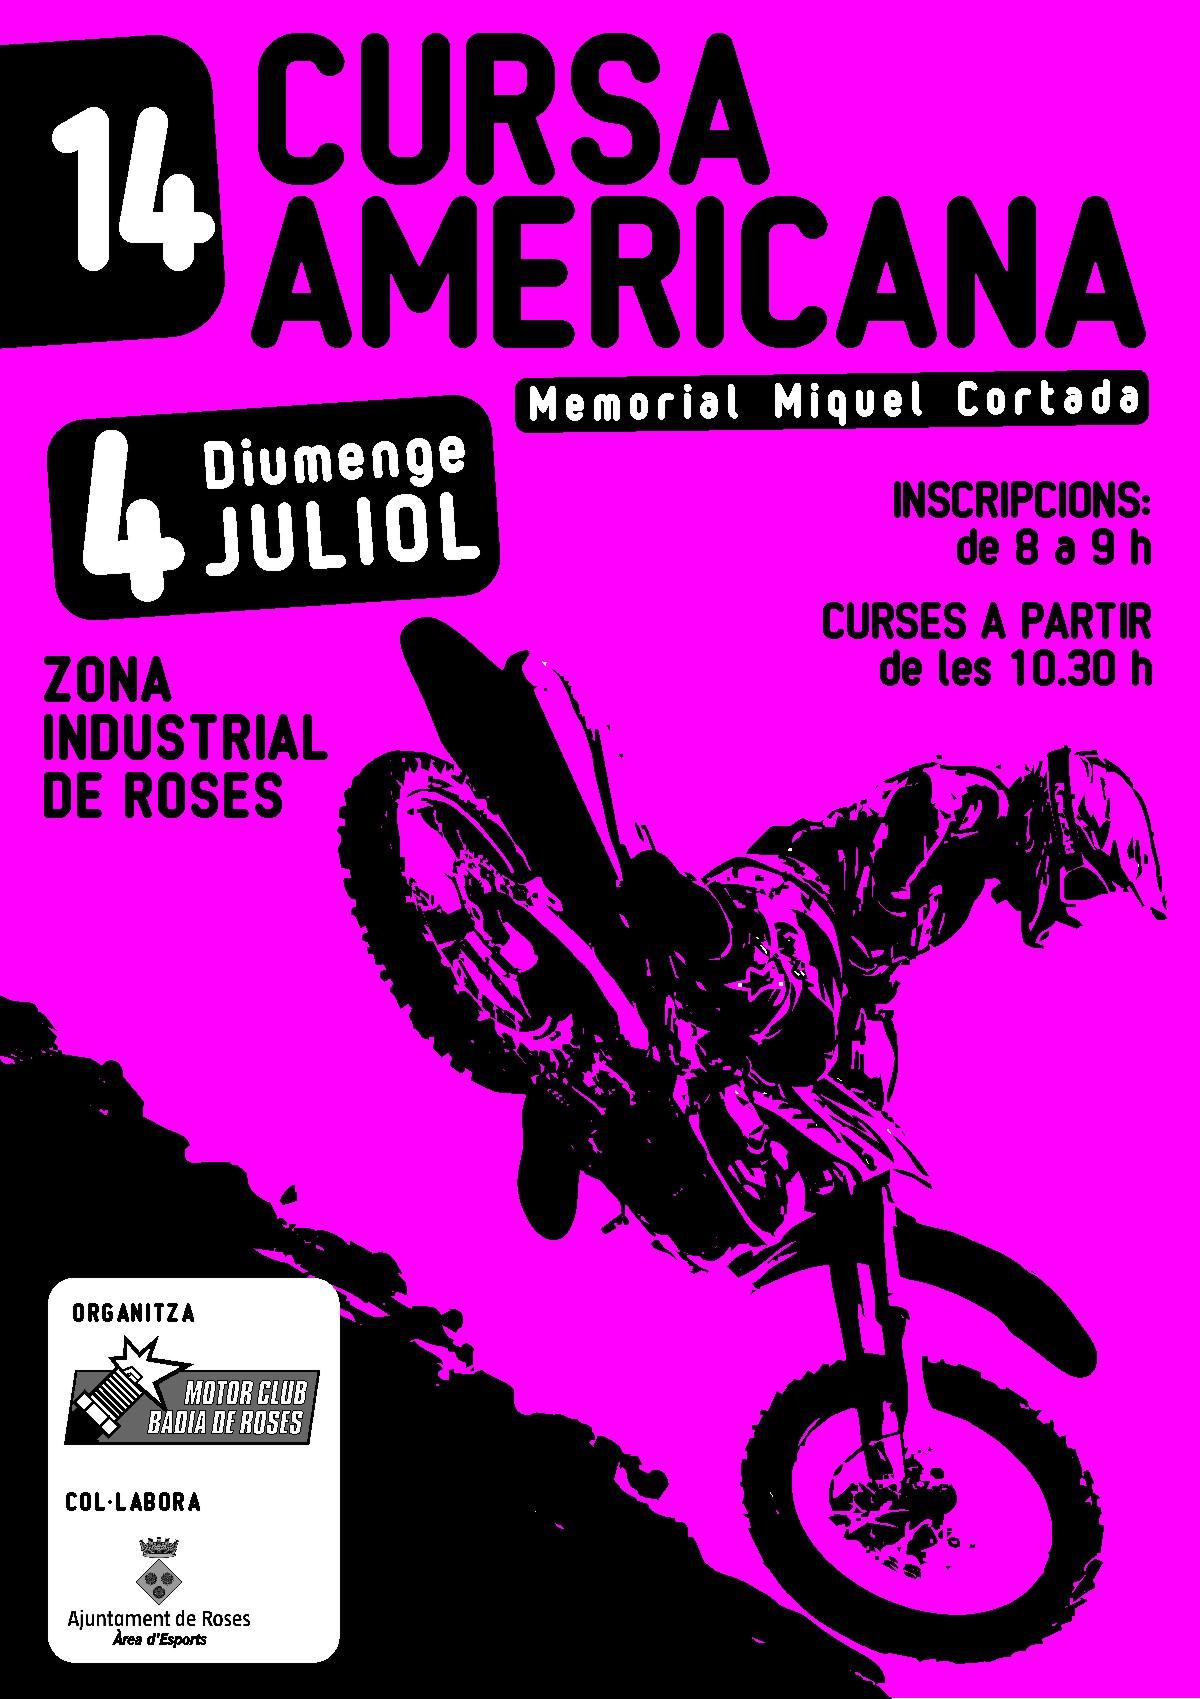 poster-cursa-americana-2010